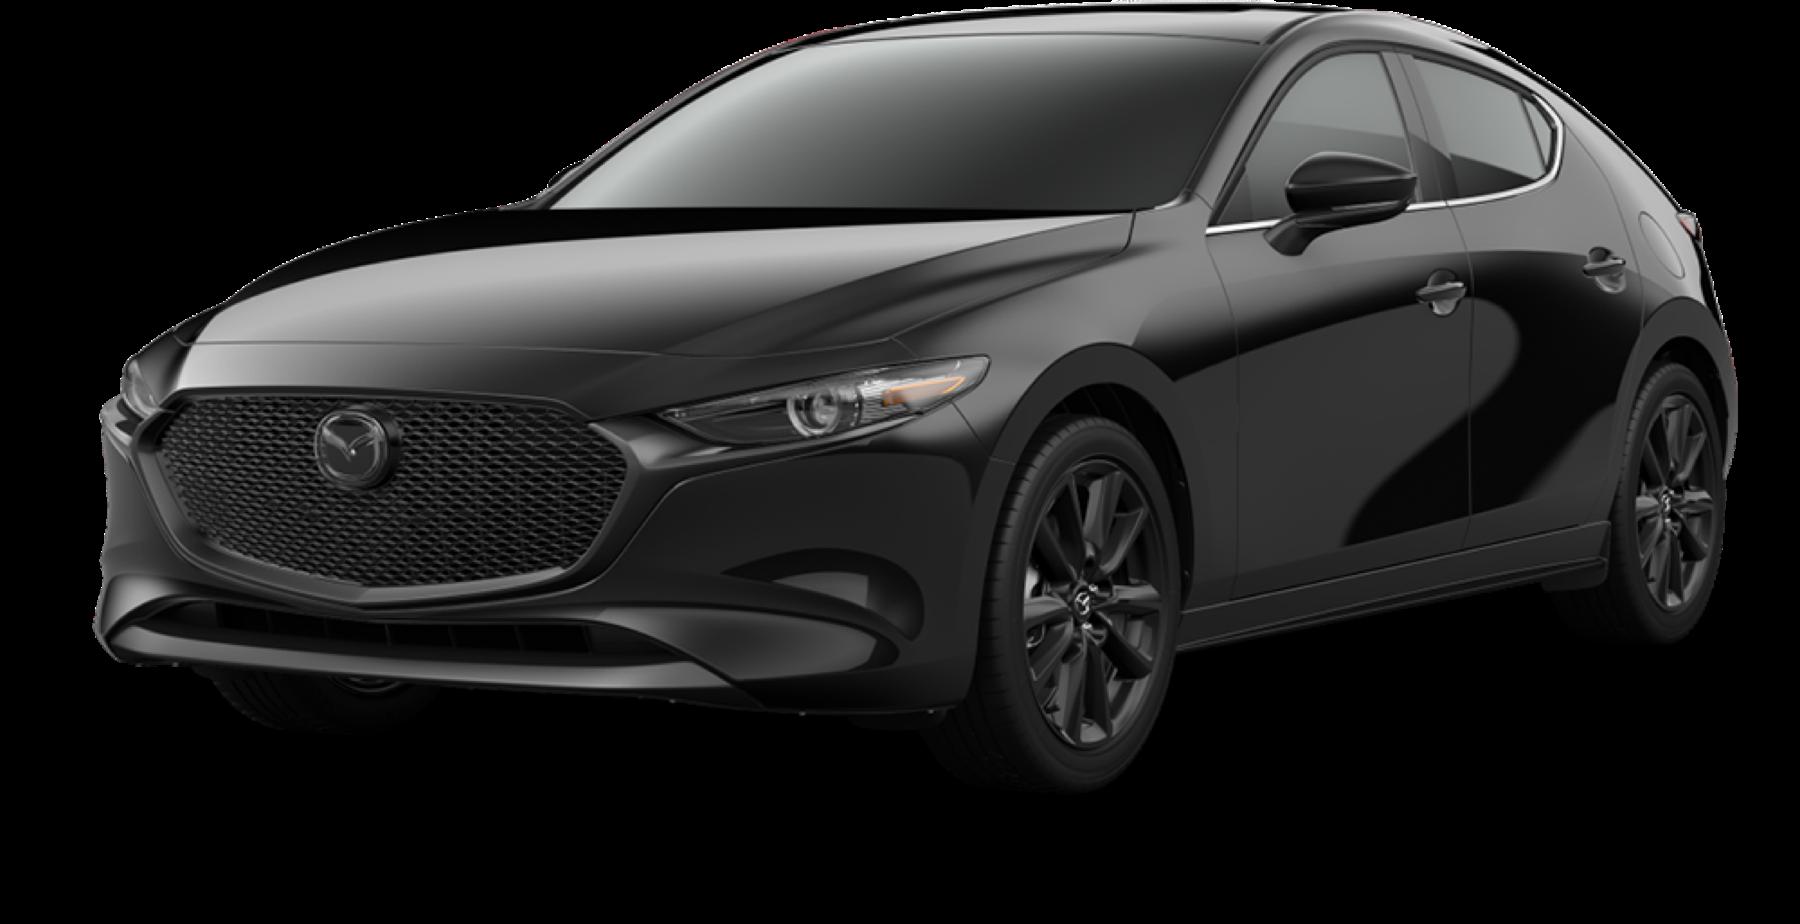 2021 Mazda3 Hatchback, Jet Black Mica